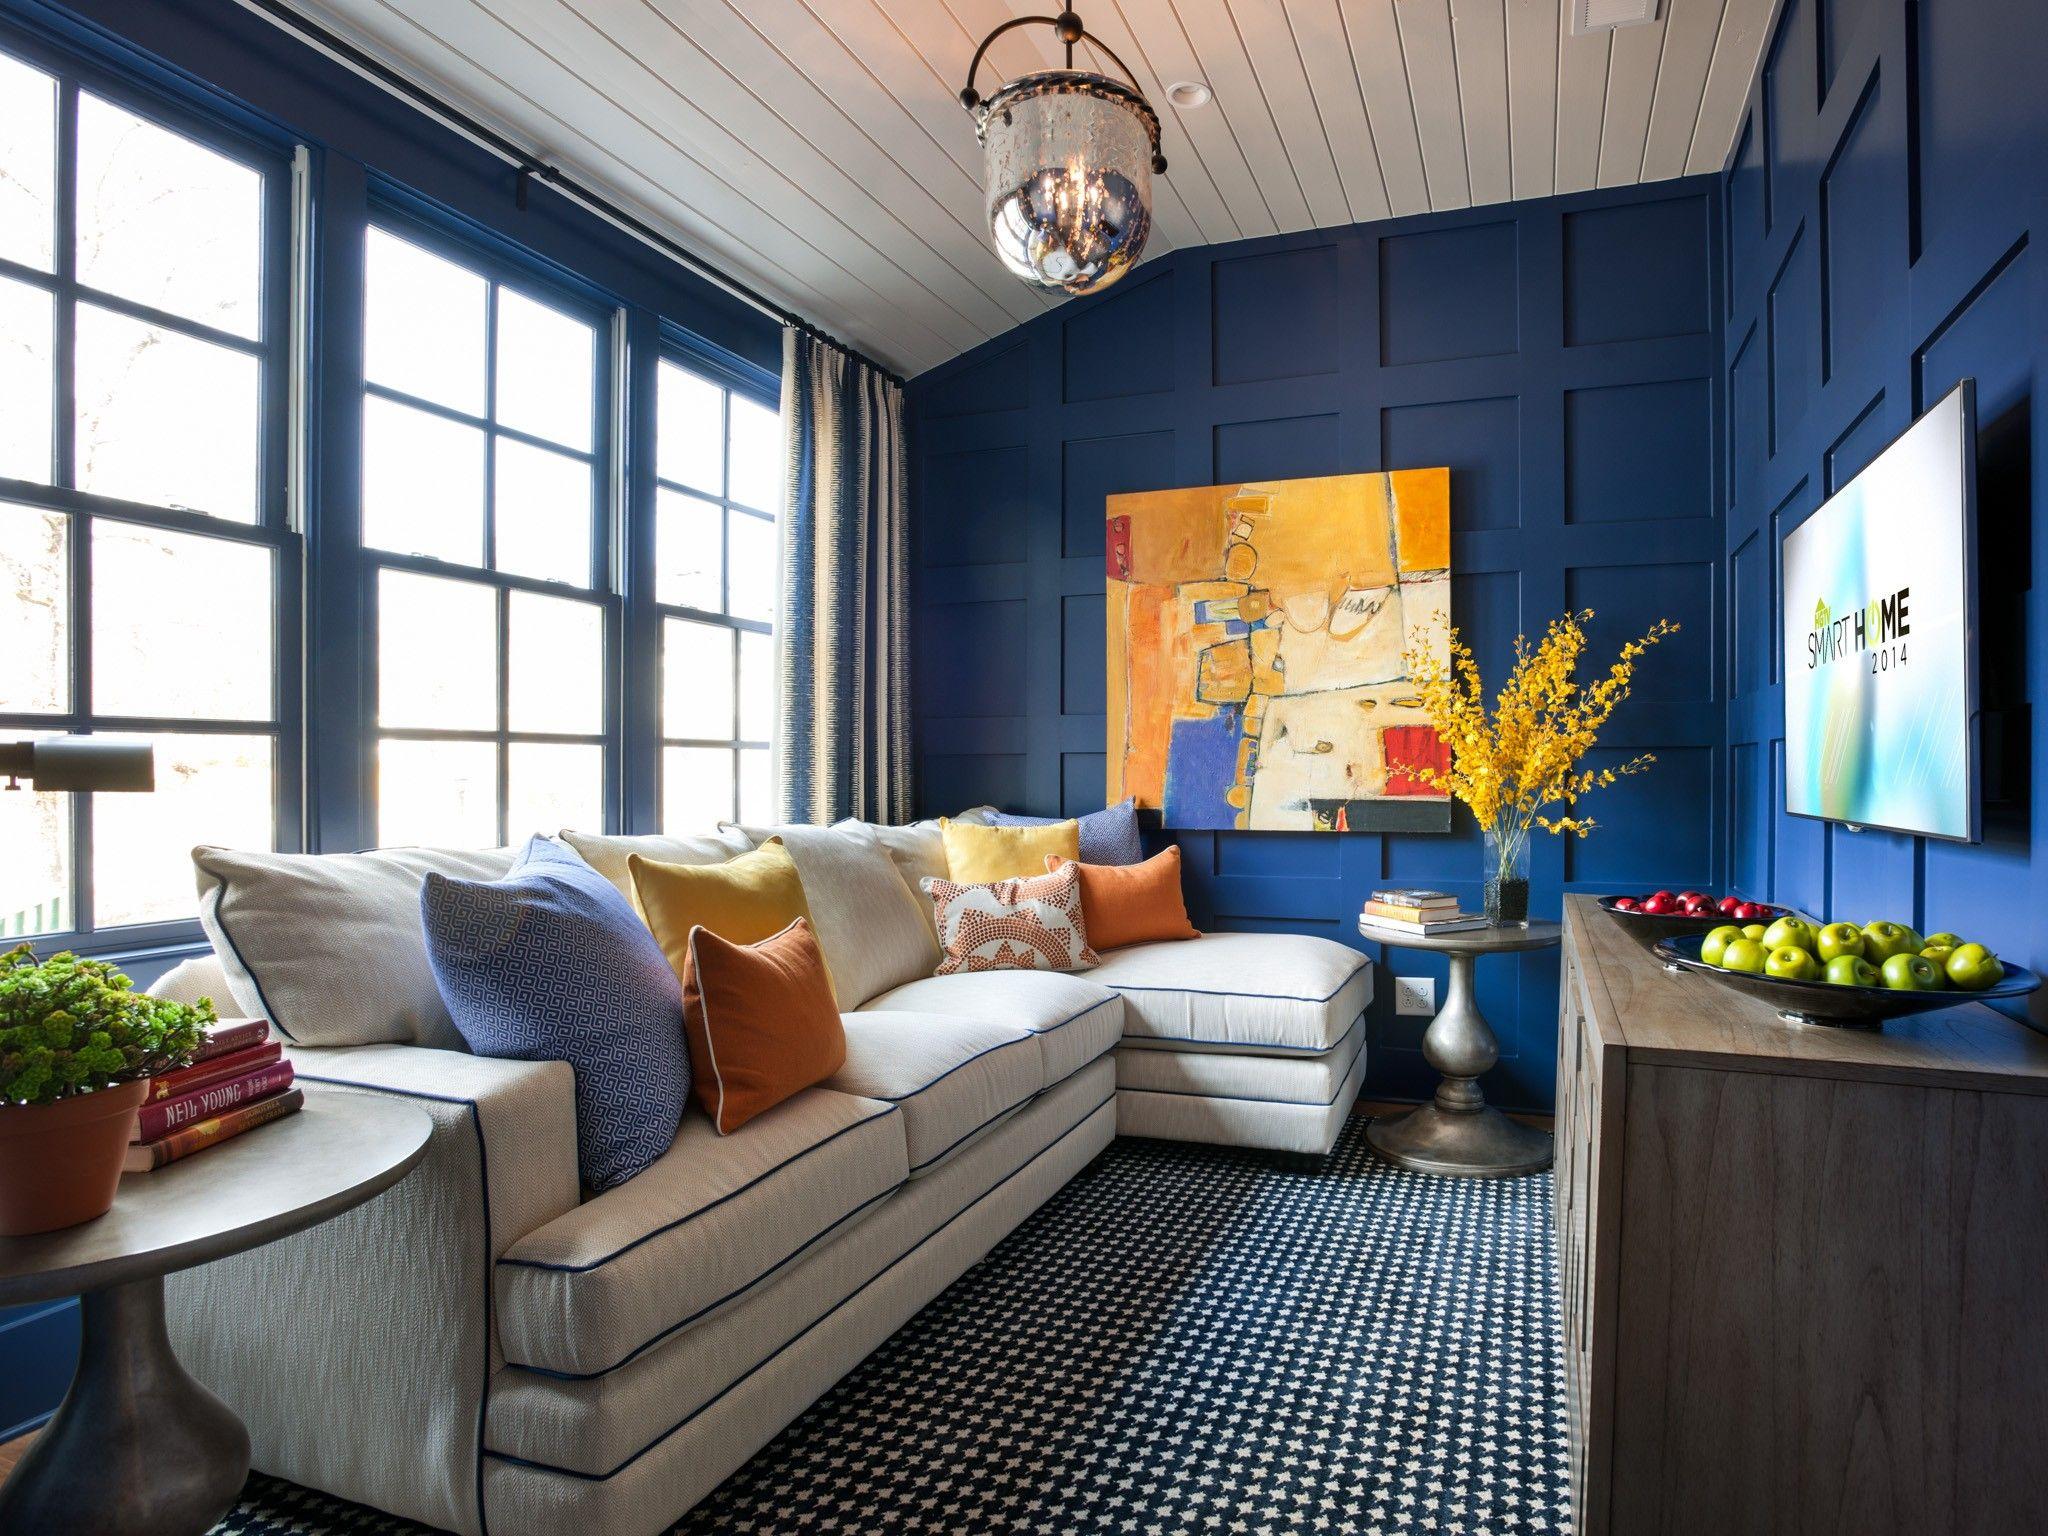 Beautiful Blue White Wood Glass Cool Design Playroom Ideas Kids  Windows Slide White Sofa Wallmount Tv Blue Wall Apint Carpet Dresser At  Kids Room With Home  ...